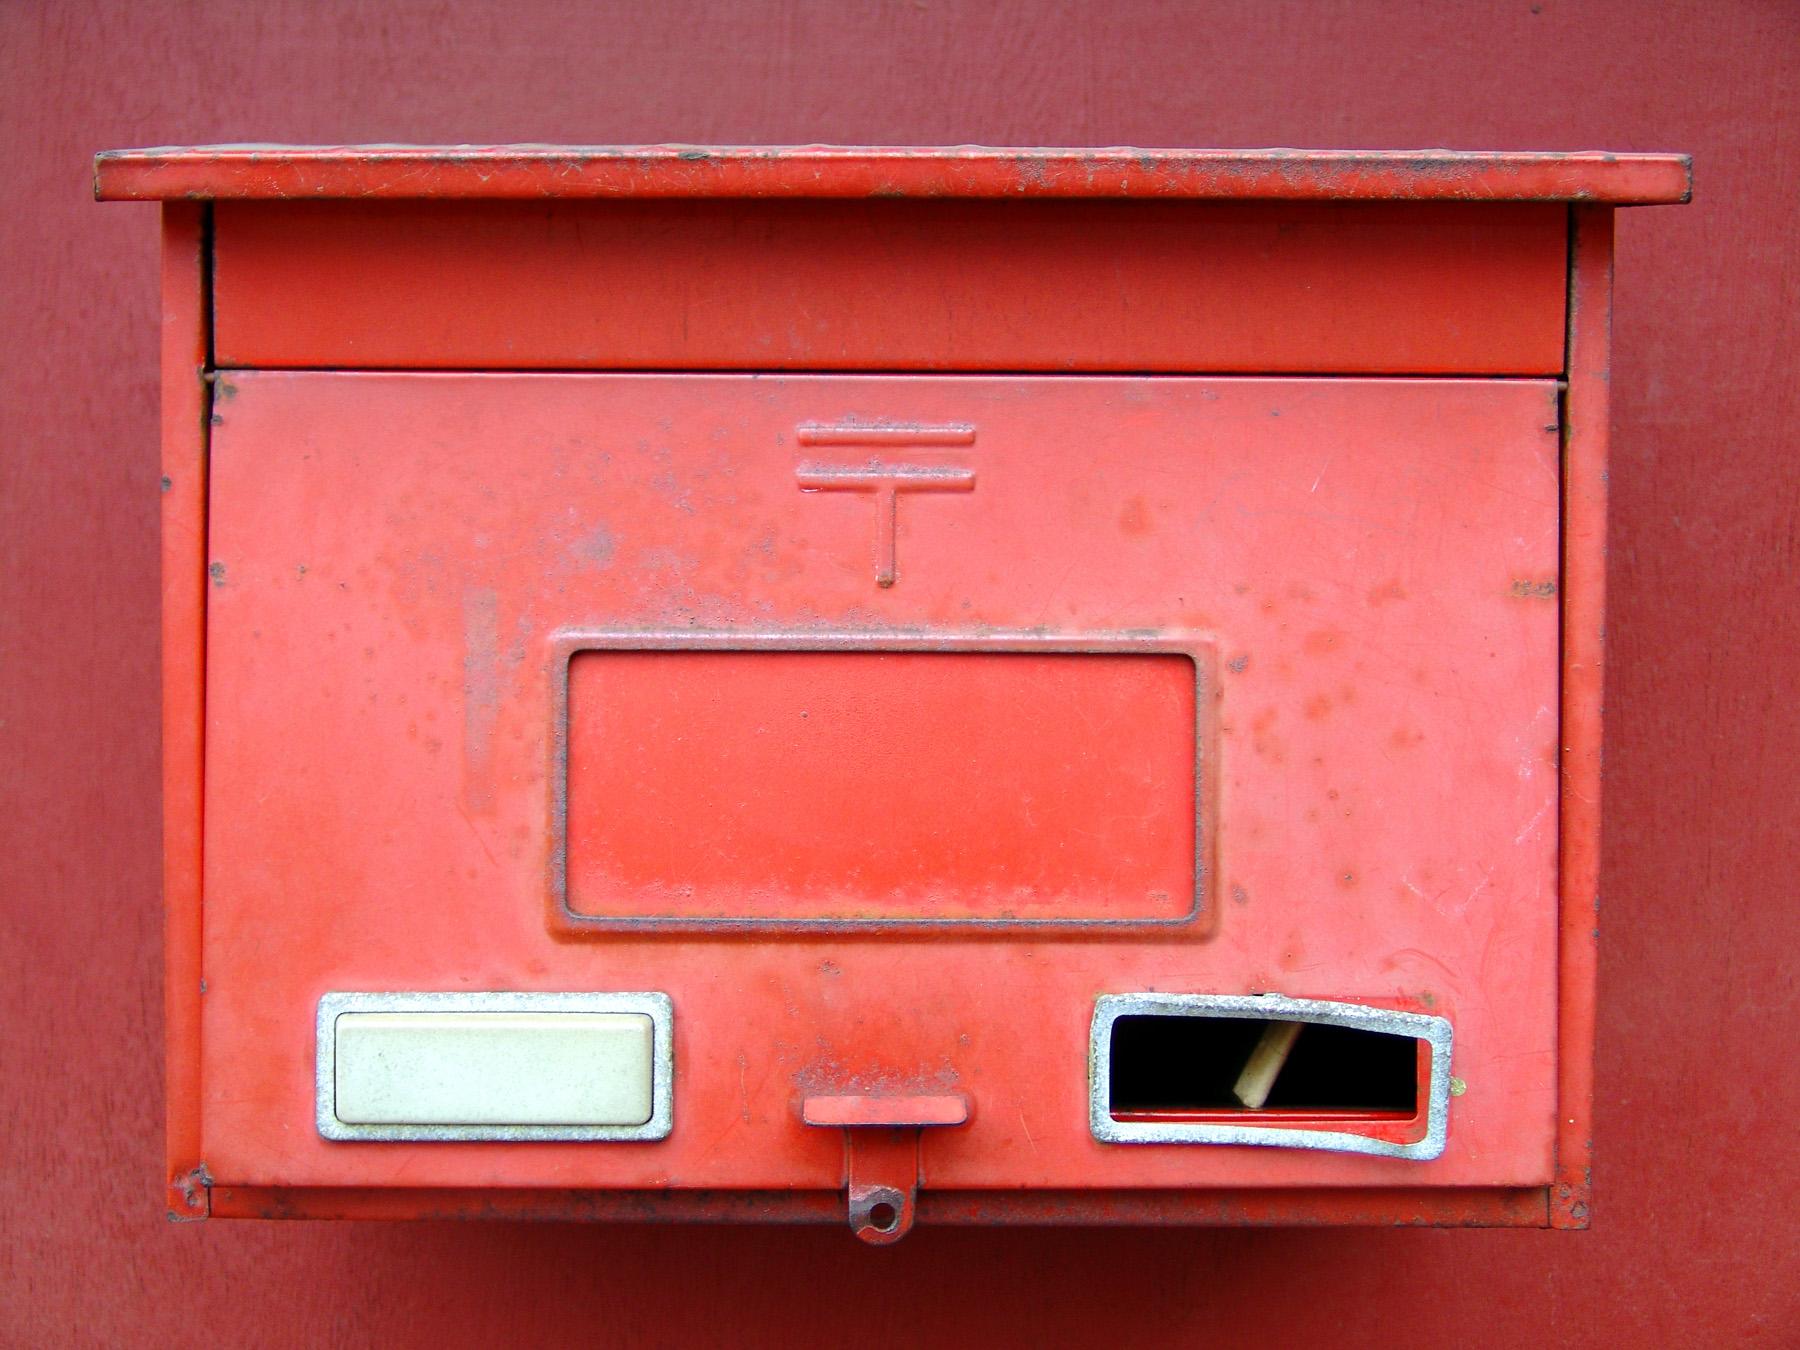 FileRed Mailbox Red Door.jpg & File:Red Mailbox Red Door.jpg - Wikimedia Commons